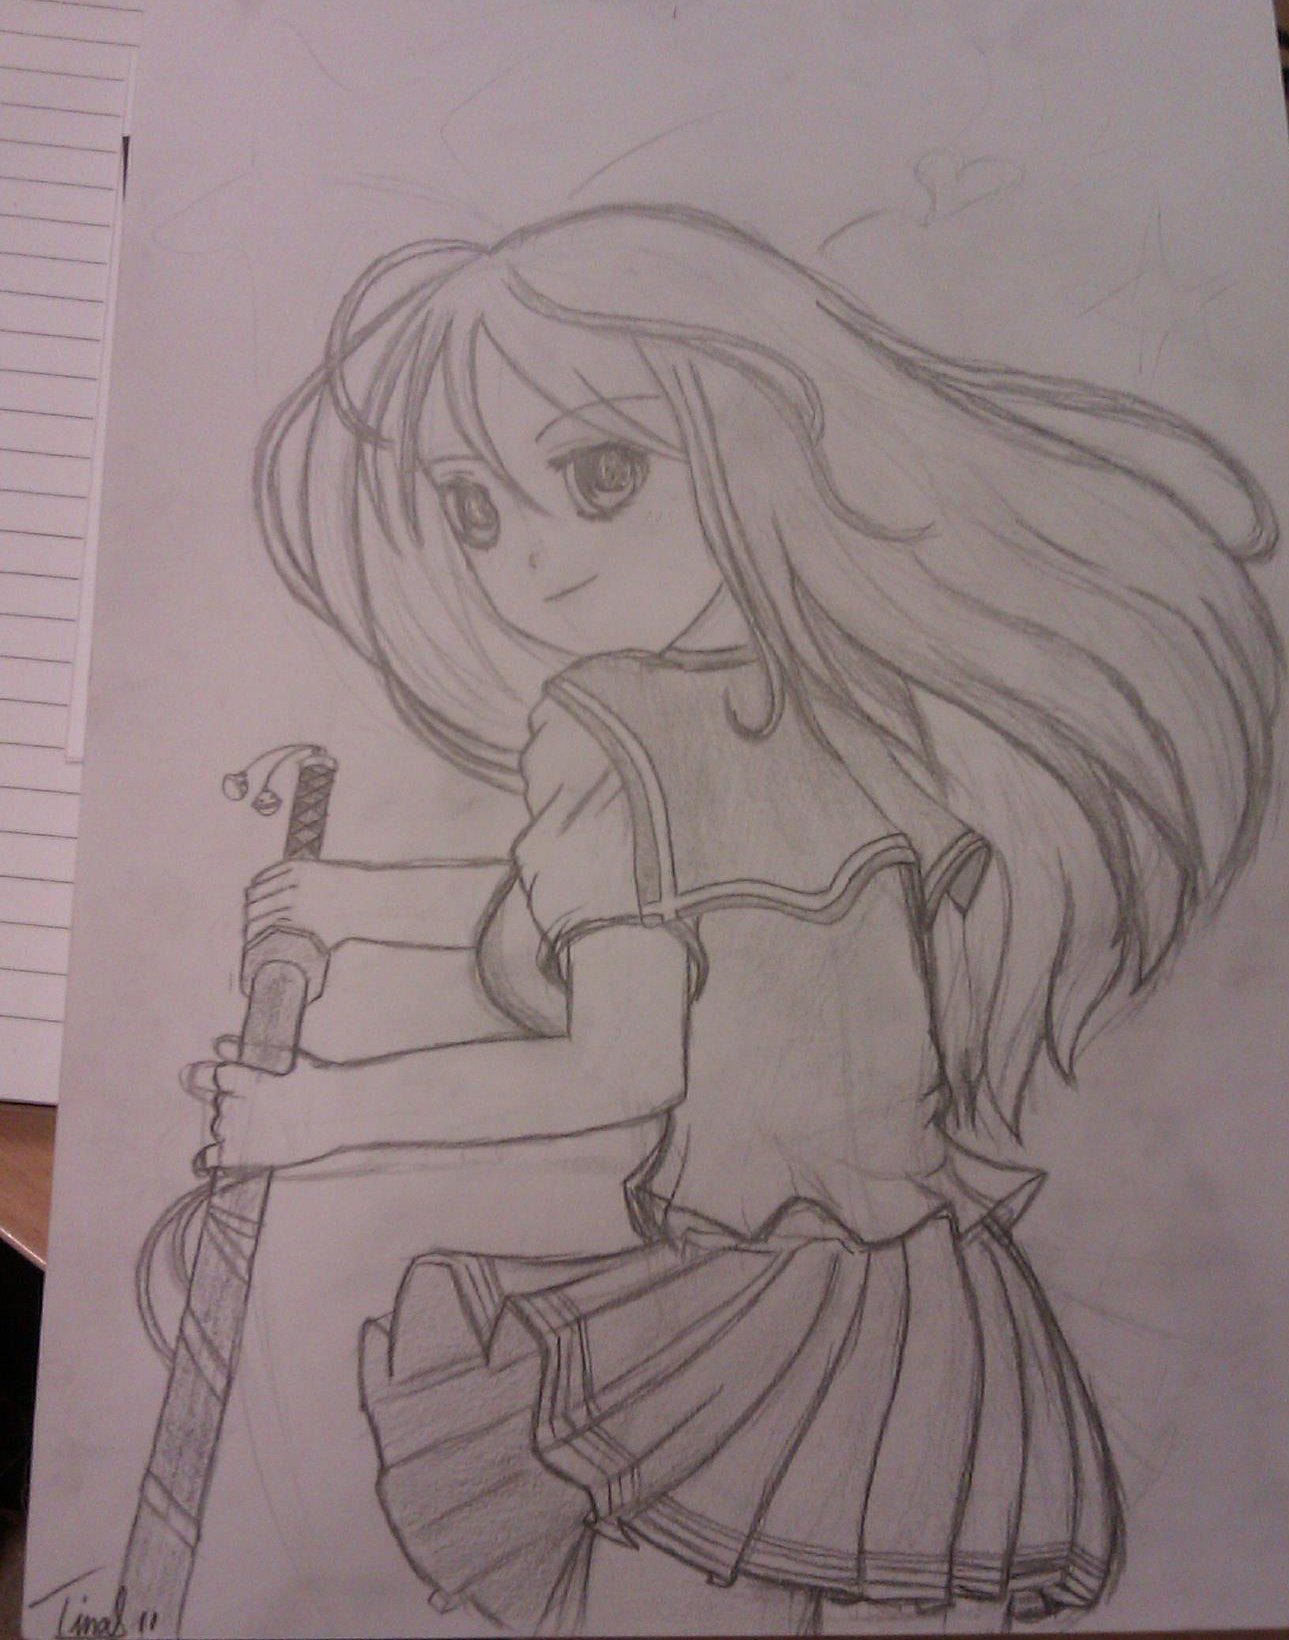 Manga schoolgirl by mirry92